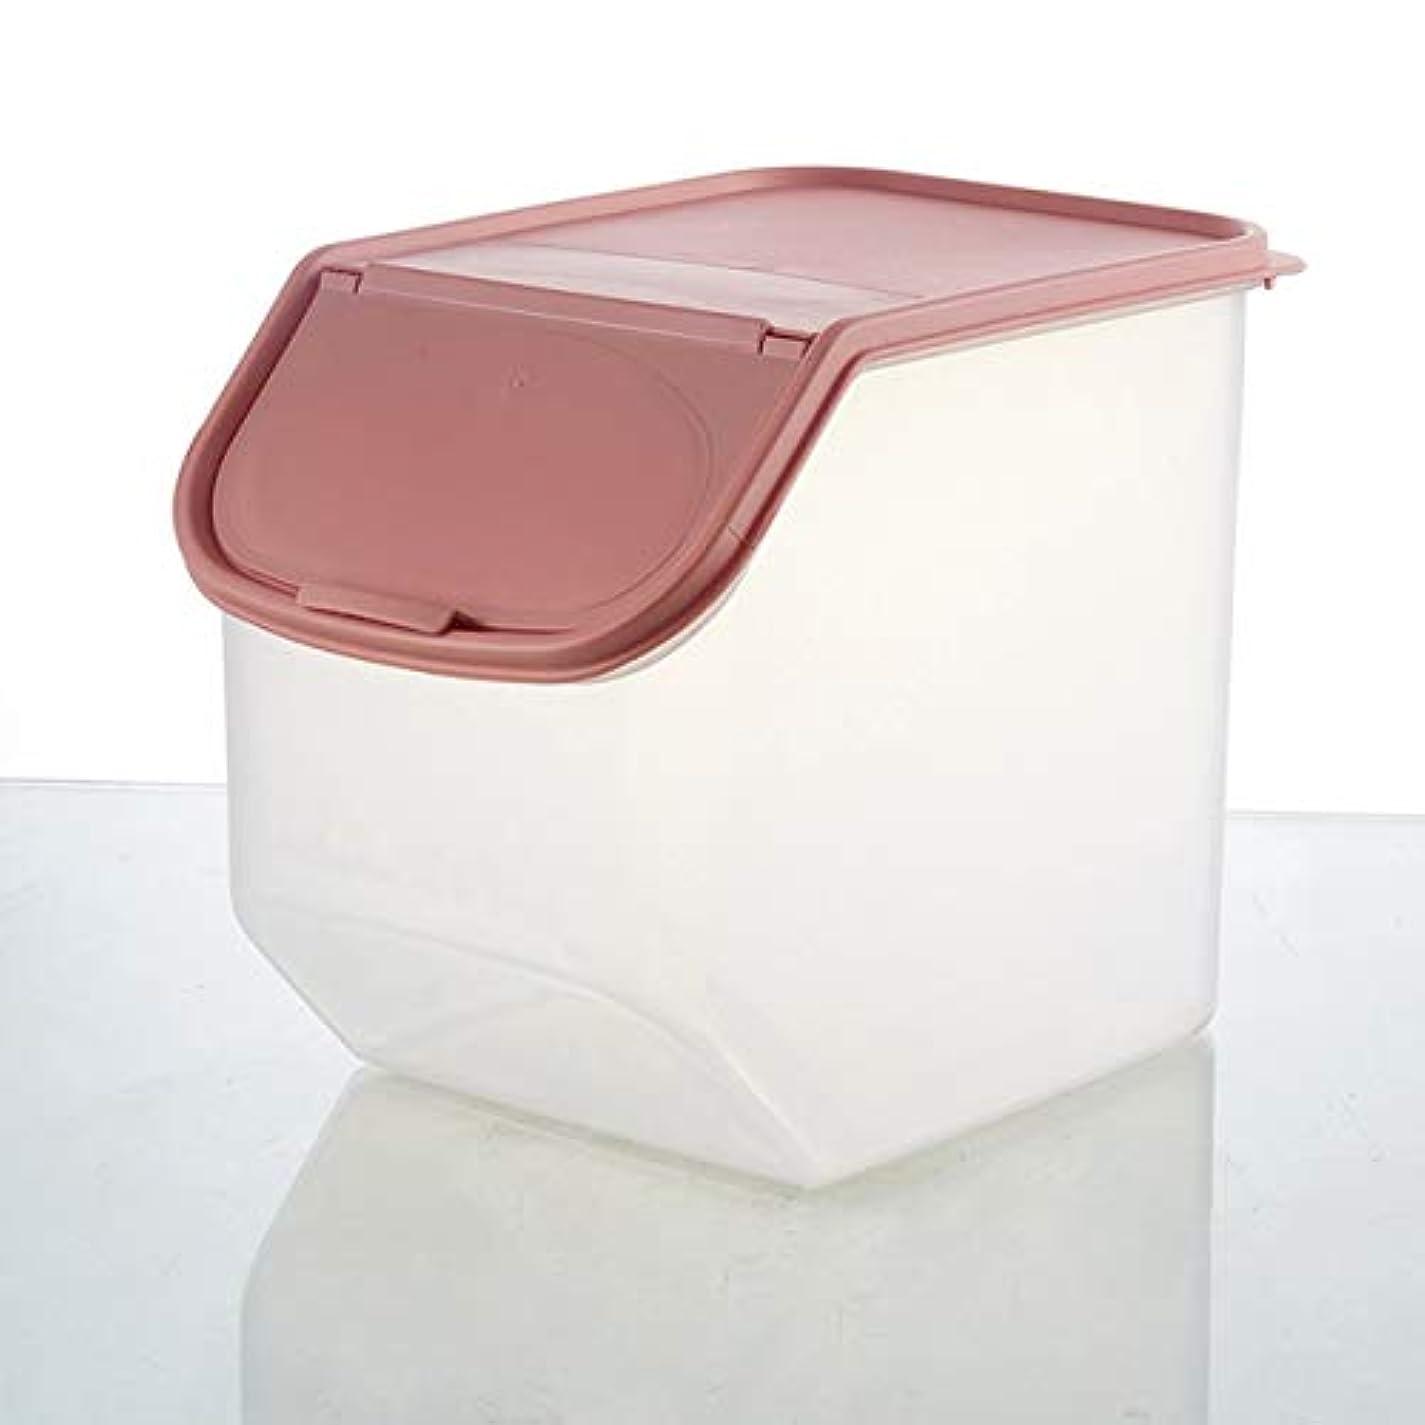 Saikogoods 家庭の使用キッチンストレージオーガナイザーは ボックスライスビン豆穀物コンテナ主催封印された食品保存を干し ピンク L